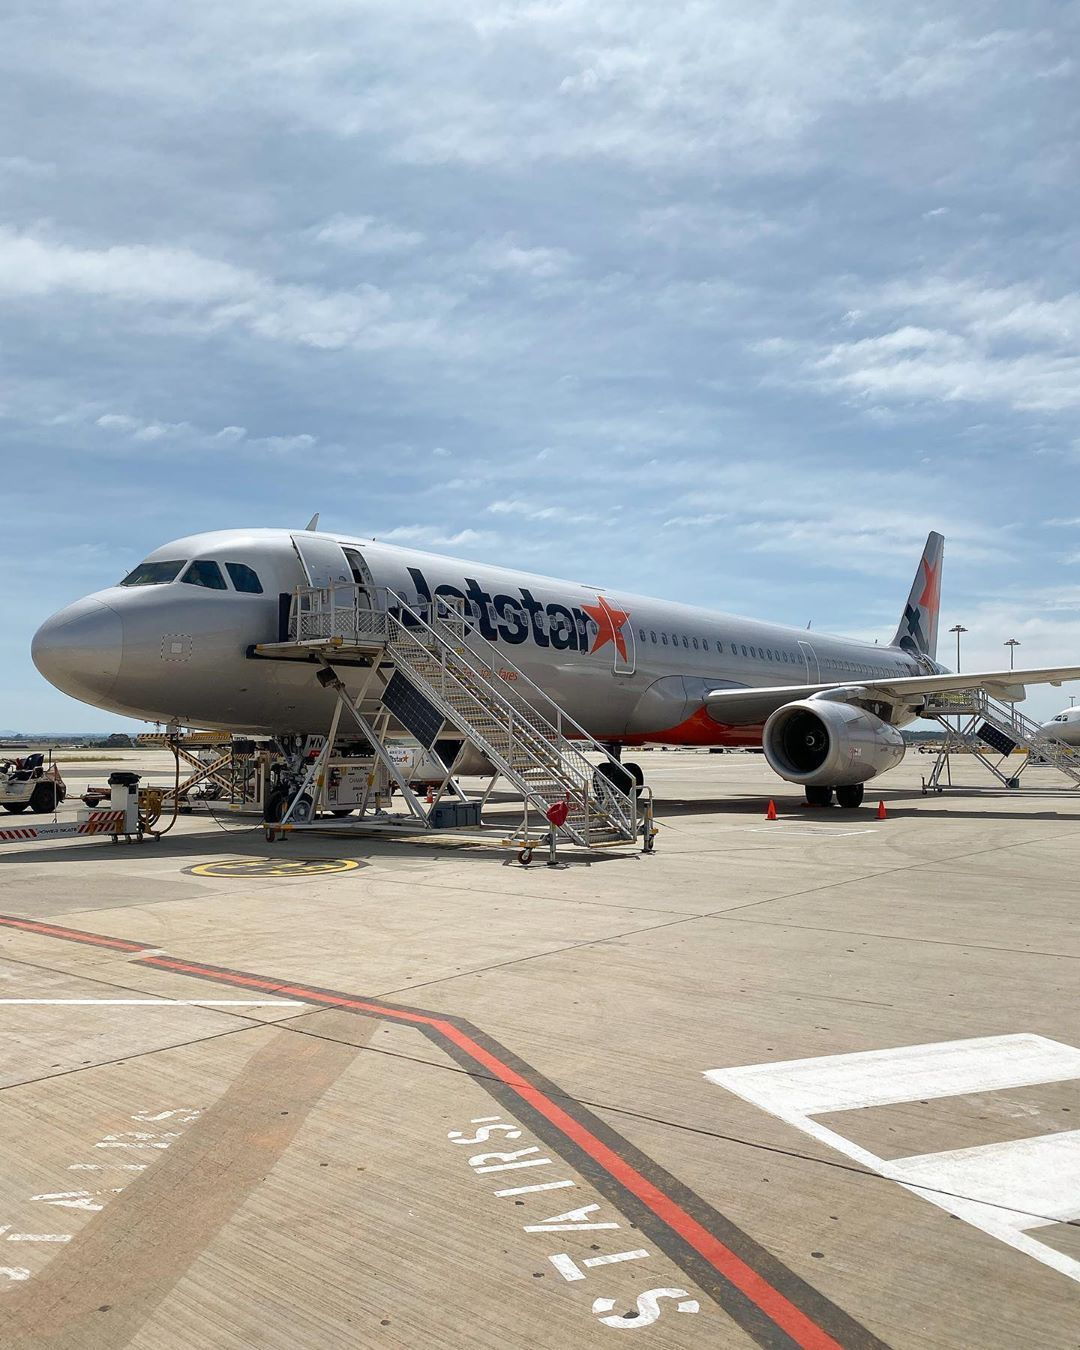 jetstar jetstaraustralia airbus a320 melbourne